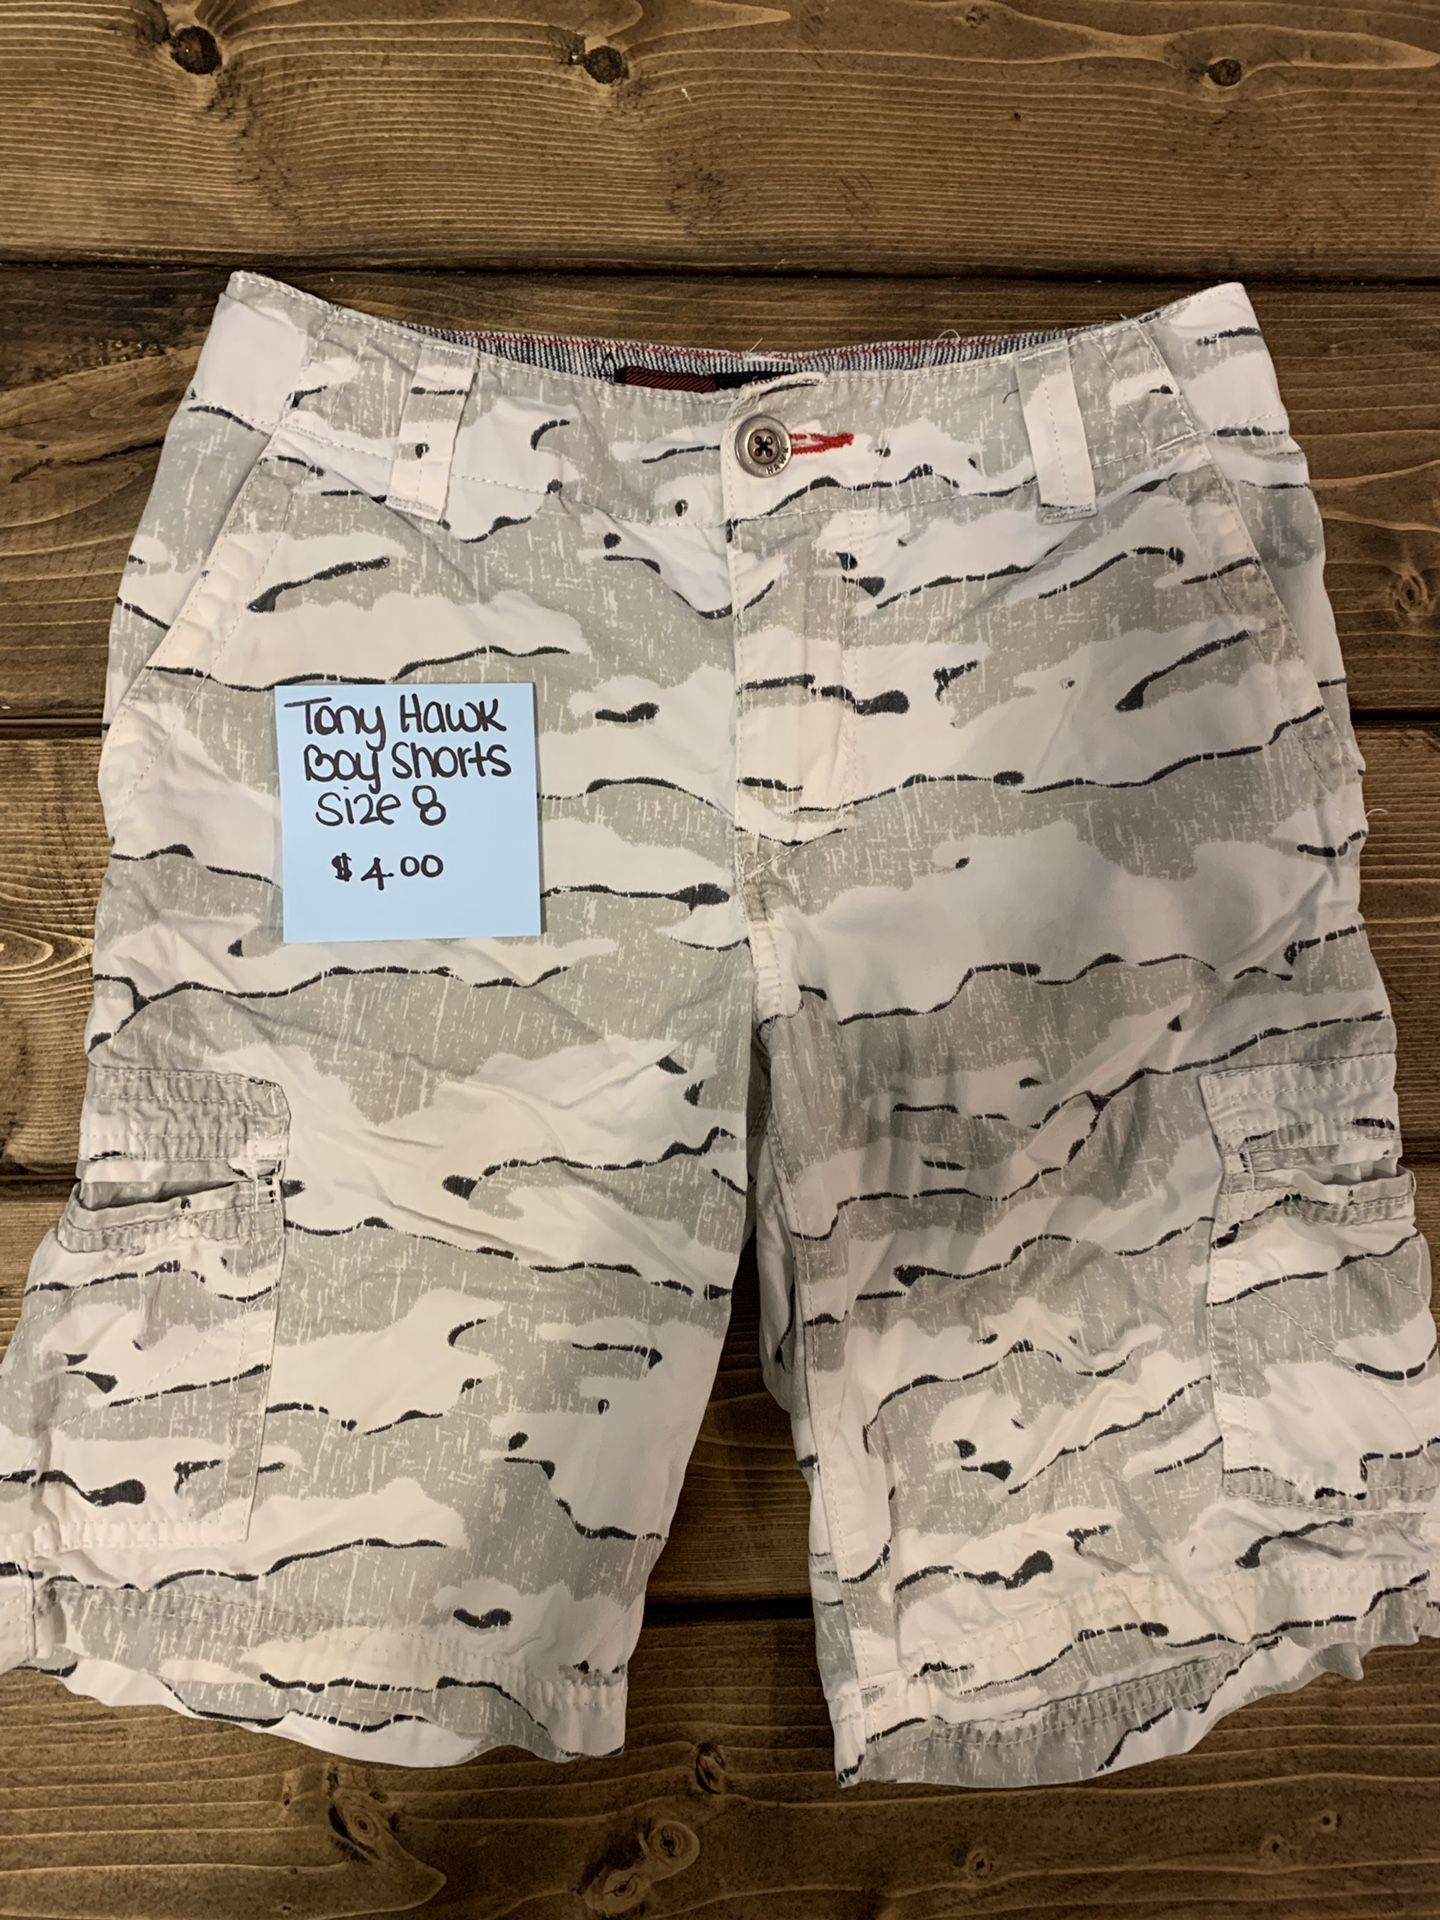 Tony Hawk boy shorts size 8